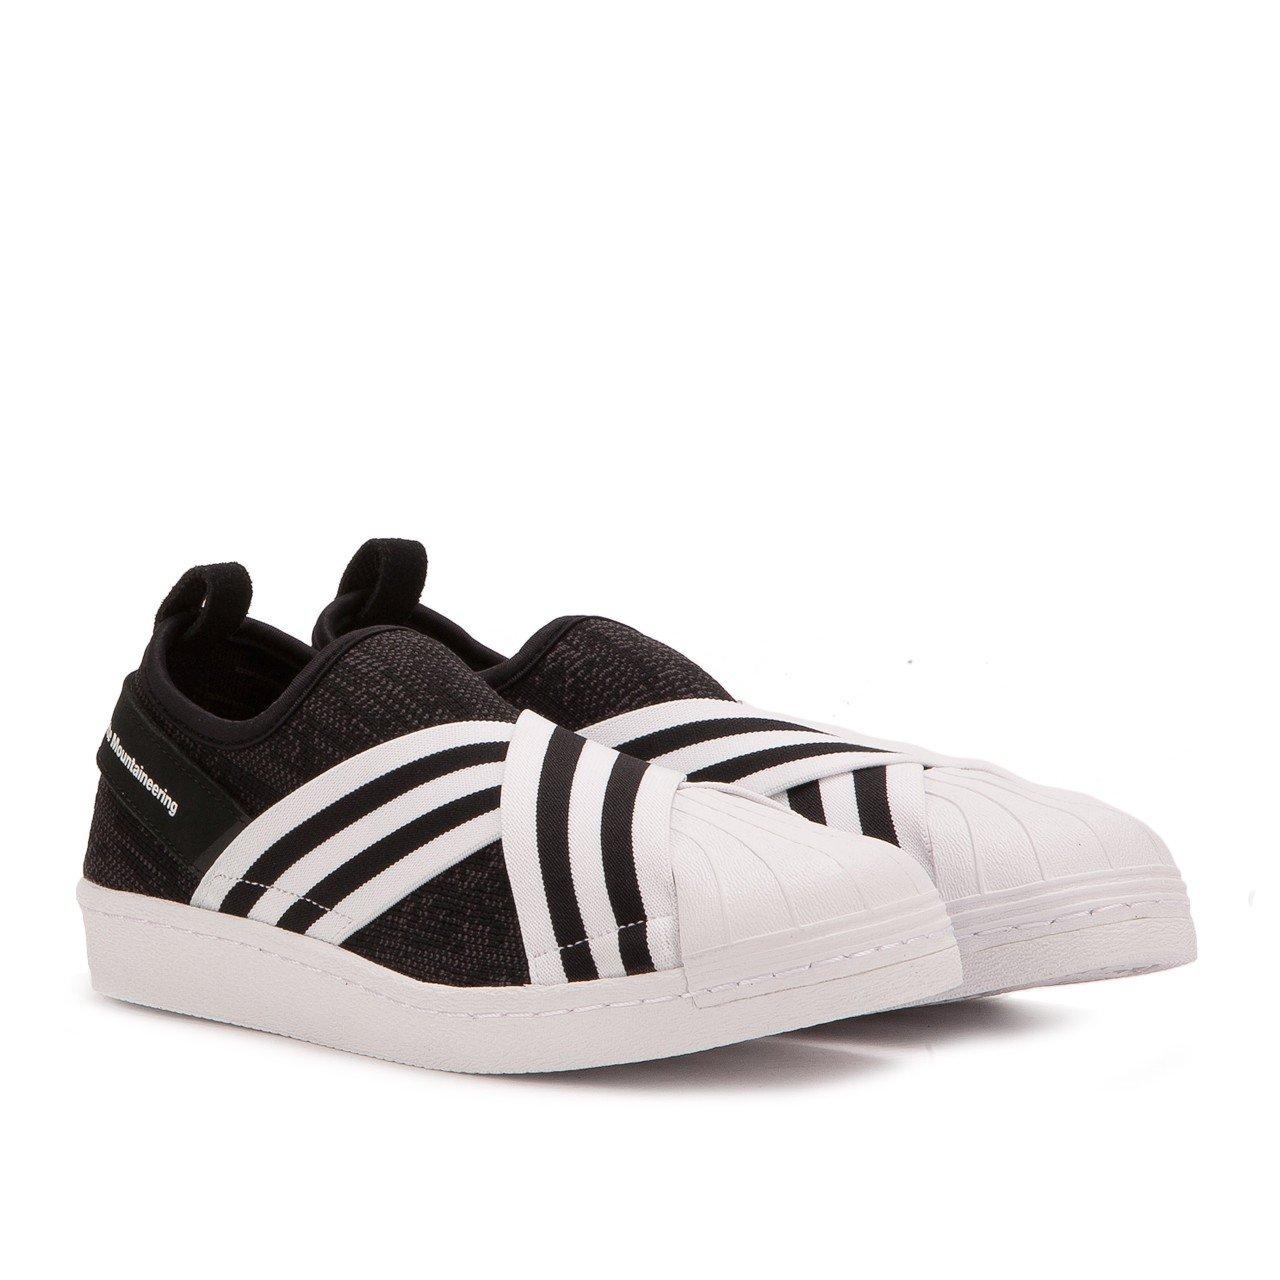 sports shoes 97cb7 29c2d adidas Men White Mountaineering Superstar Slip-On Primeknit Black core  Black Footwear White Size 10.0 US